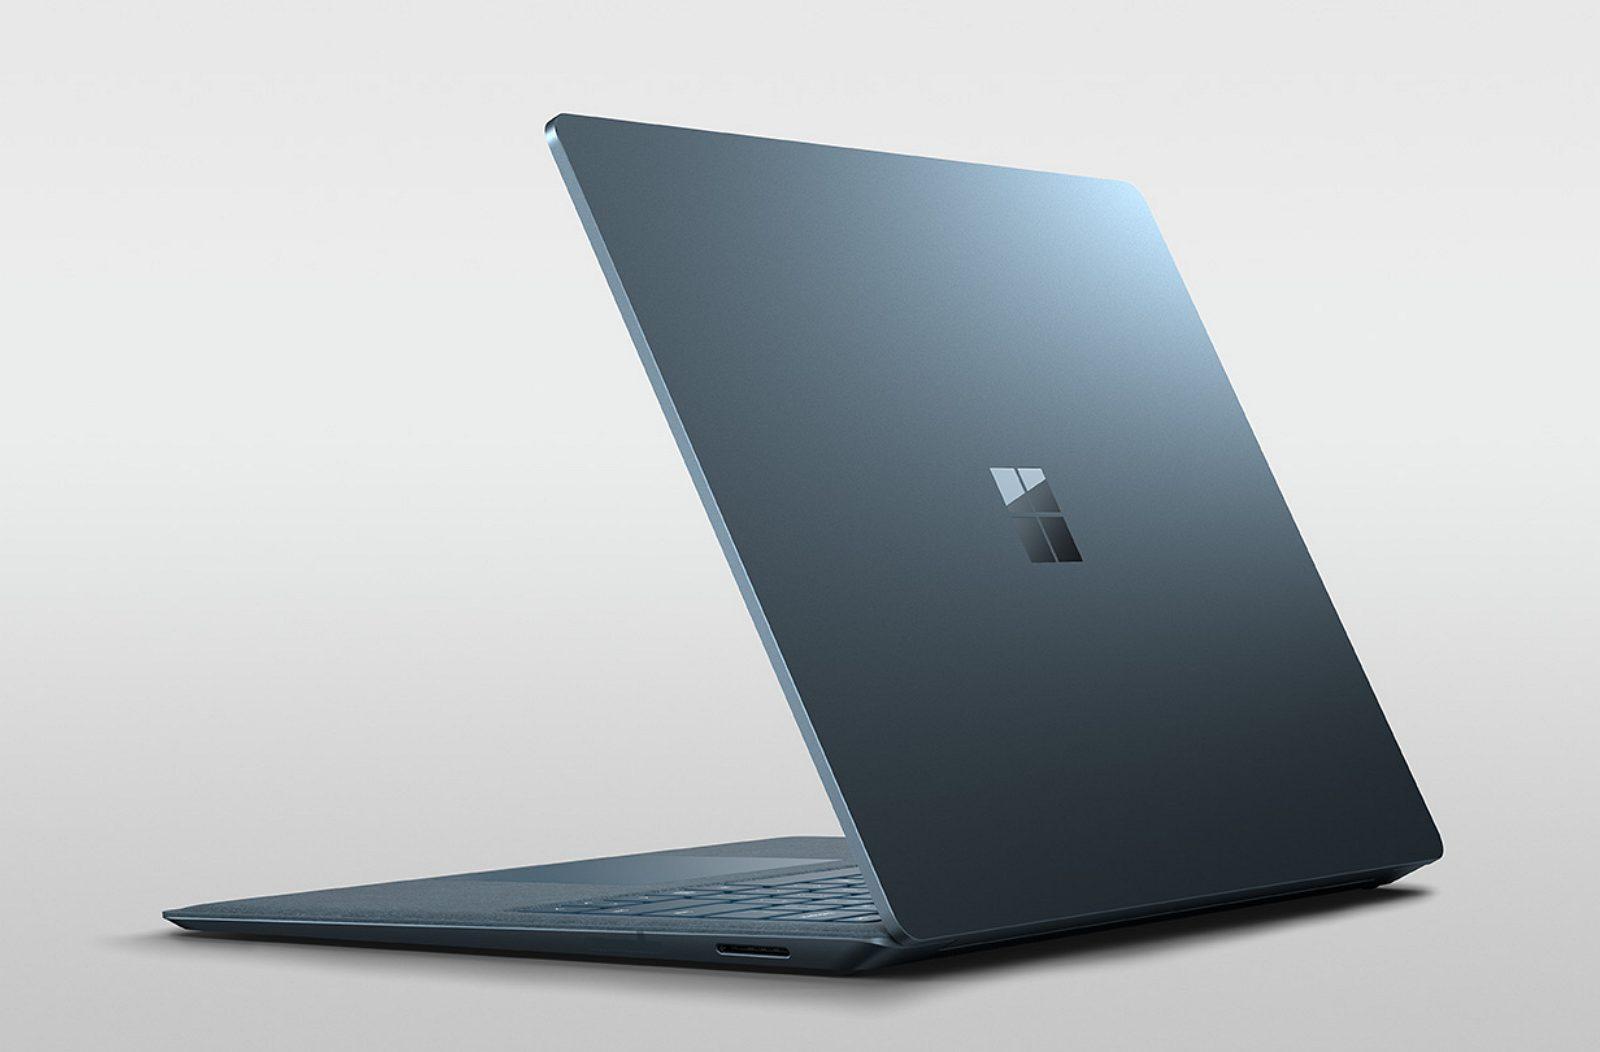 Surface Laptop 2, blue, back logo (image source Microsoft)